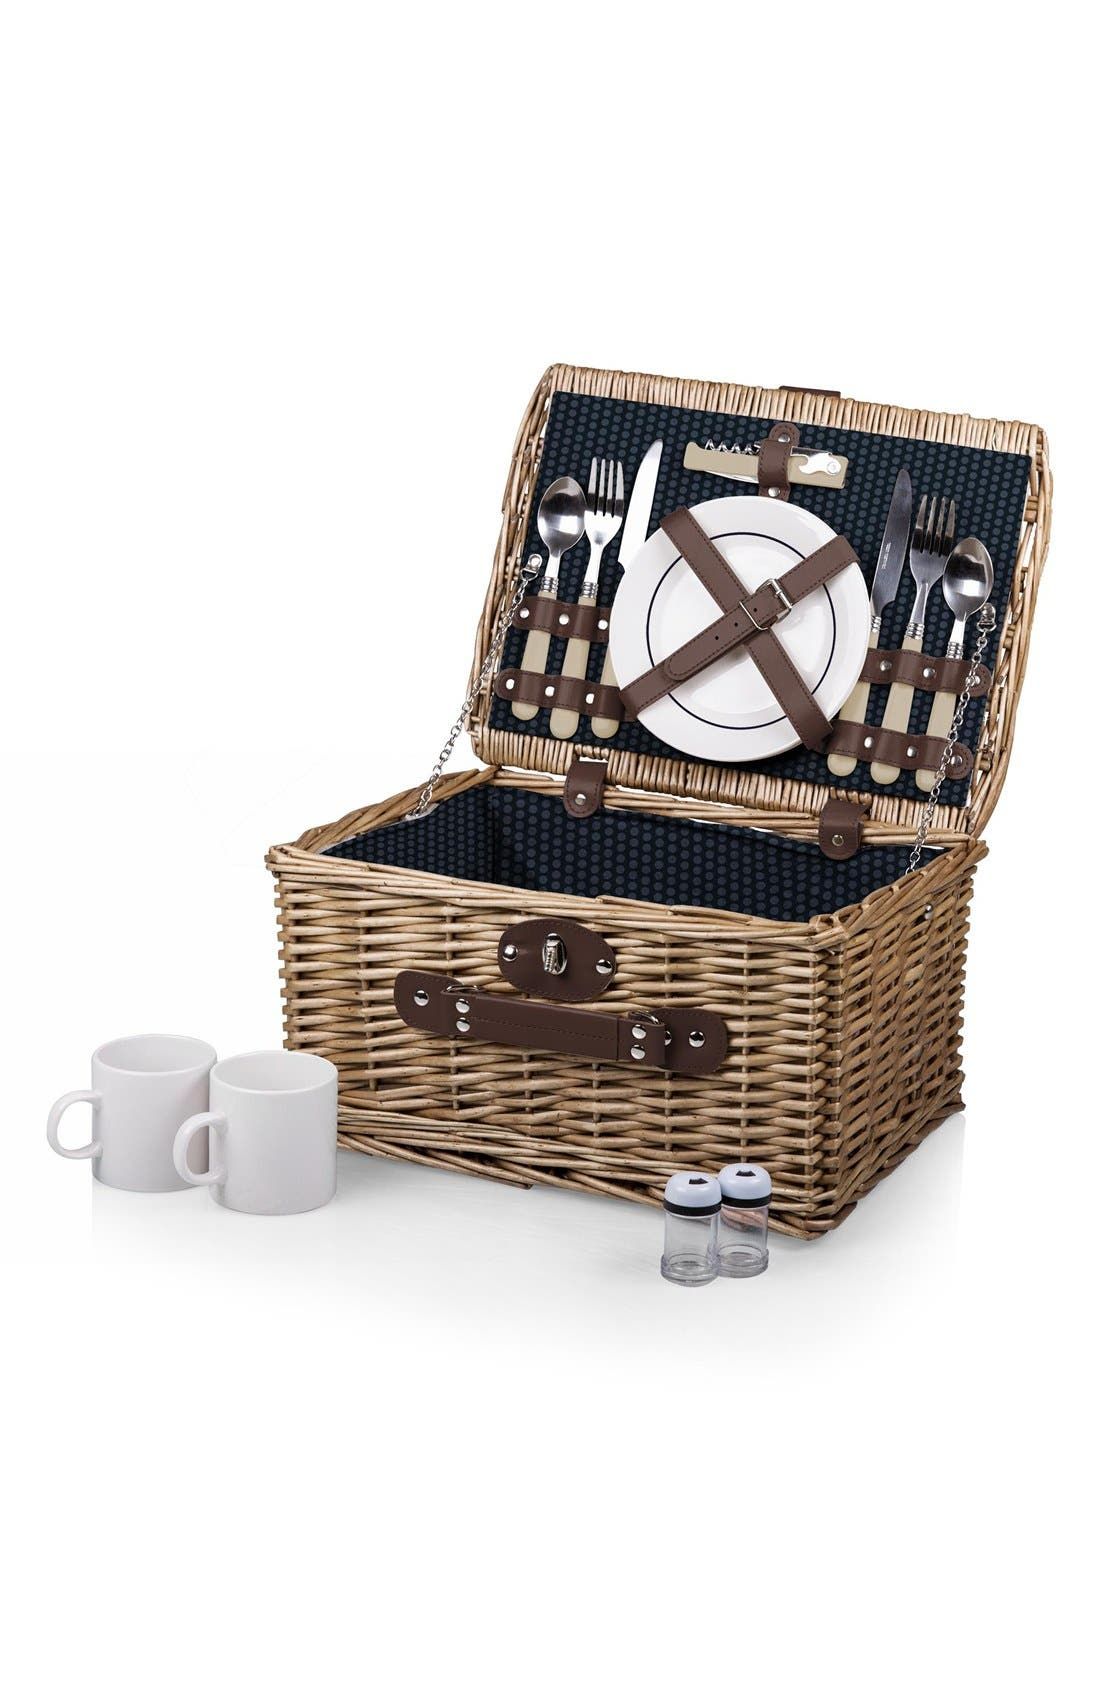 Alternate Image 1 Selected - Picnic Time 'Catalina' Wicker Picnic Basket